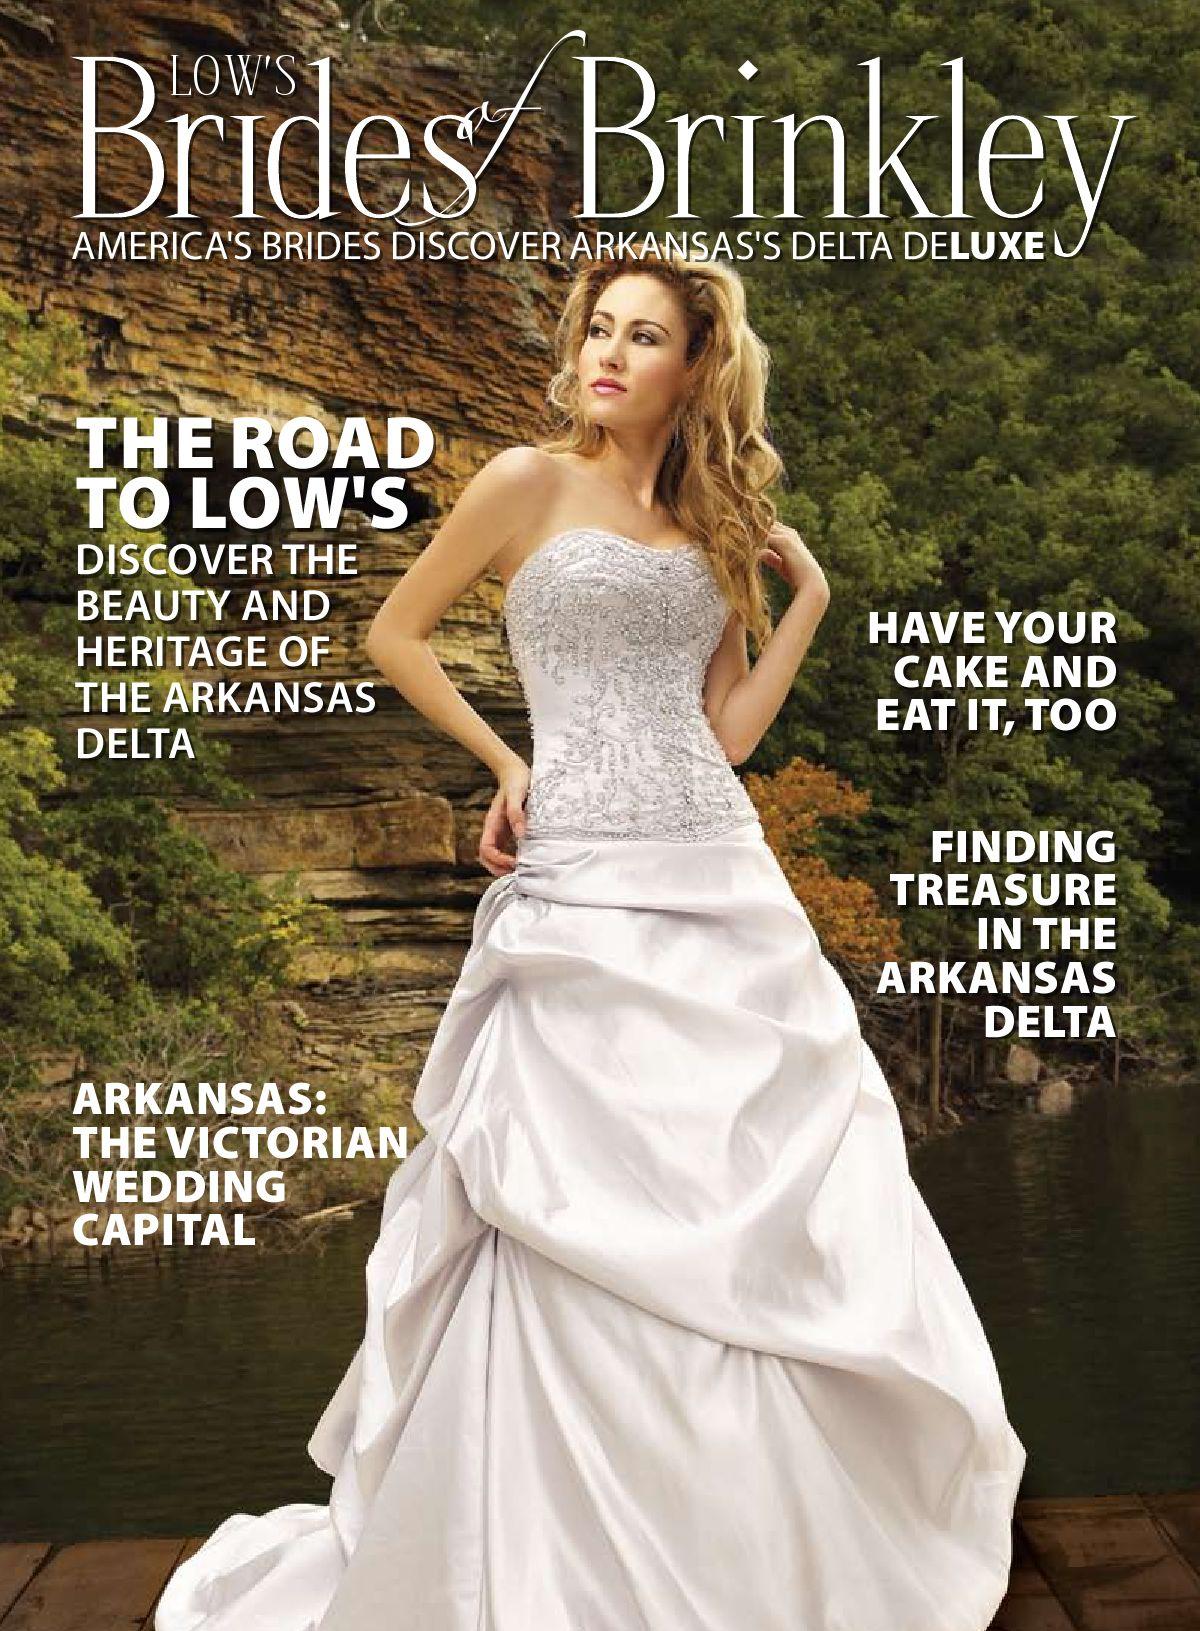 Low\'s Brides of Brinkley by Arkansas Times - issuu